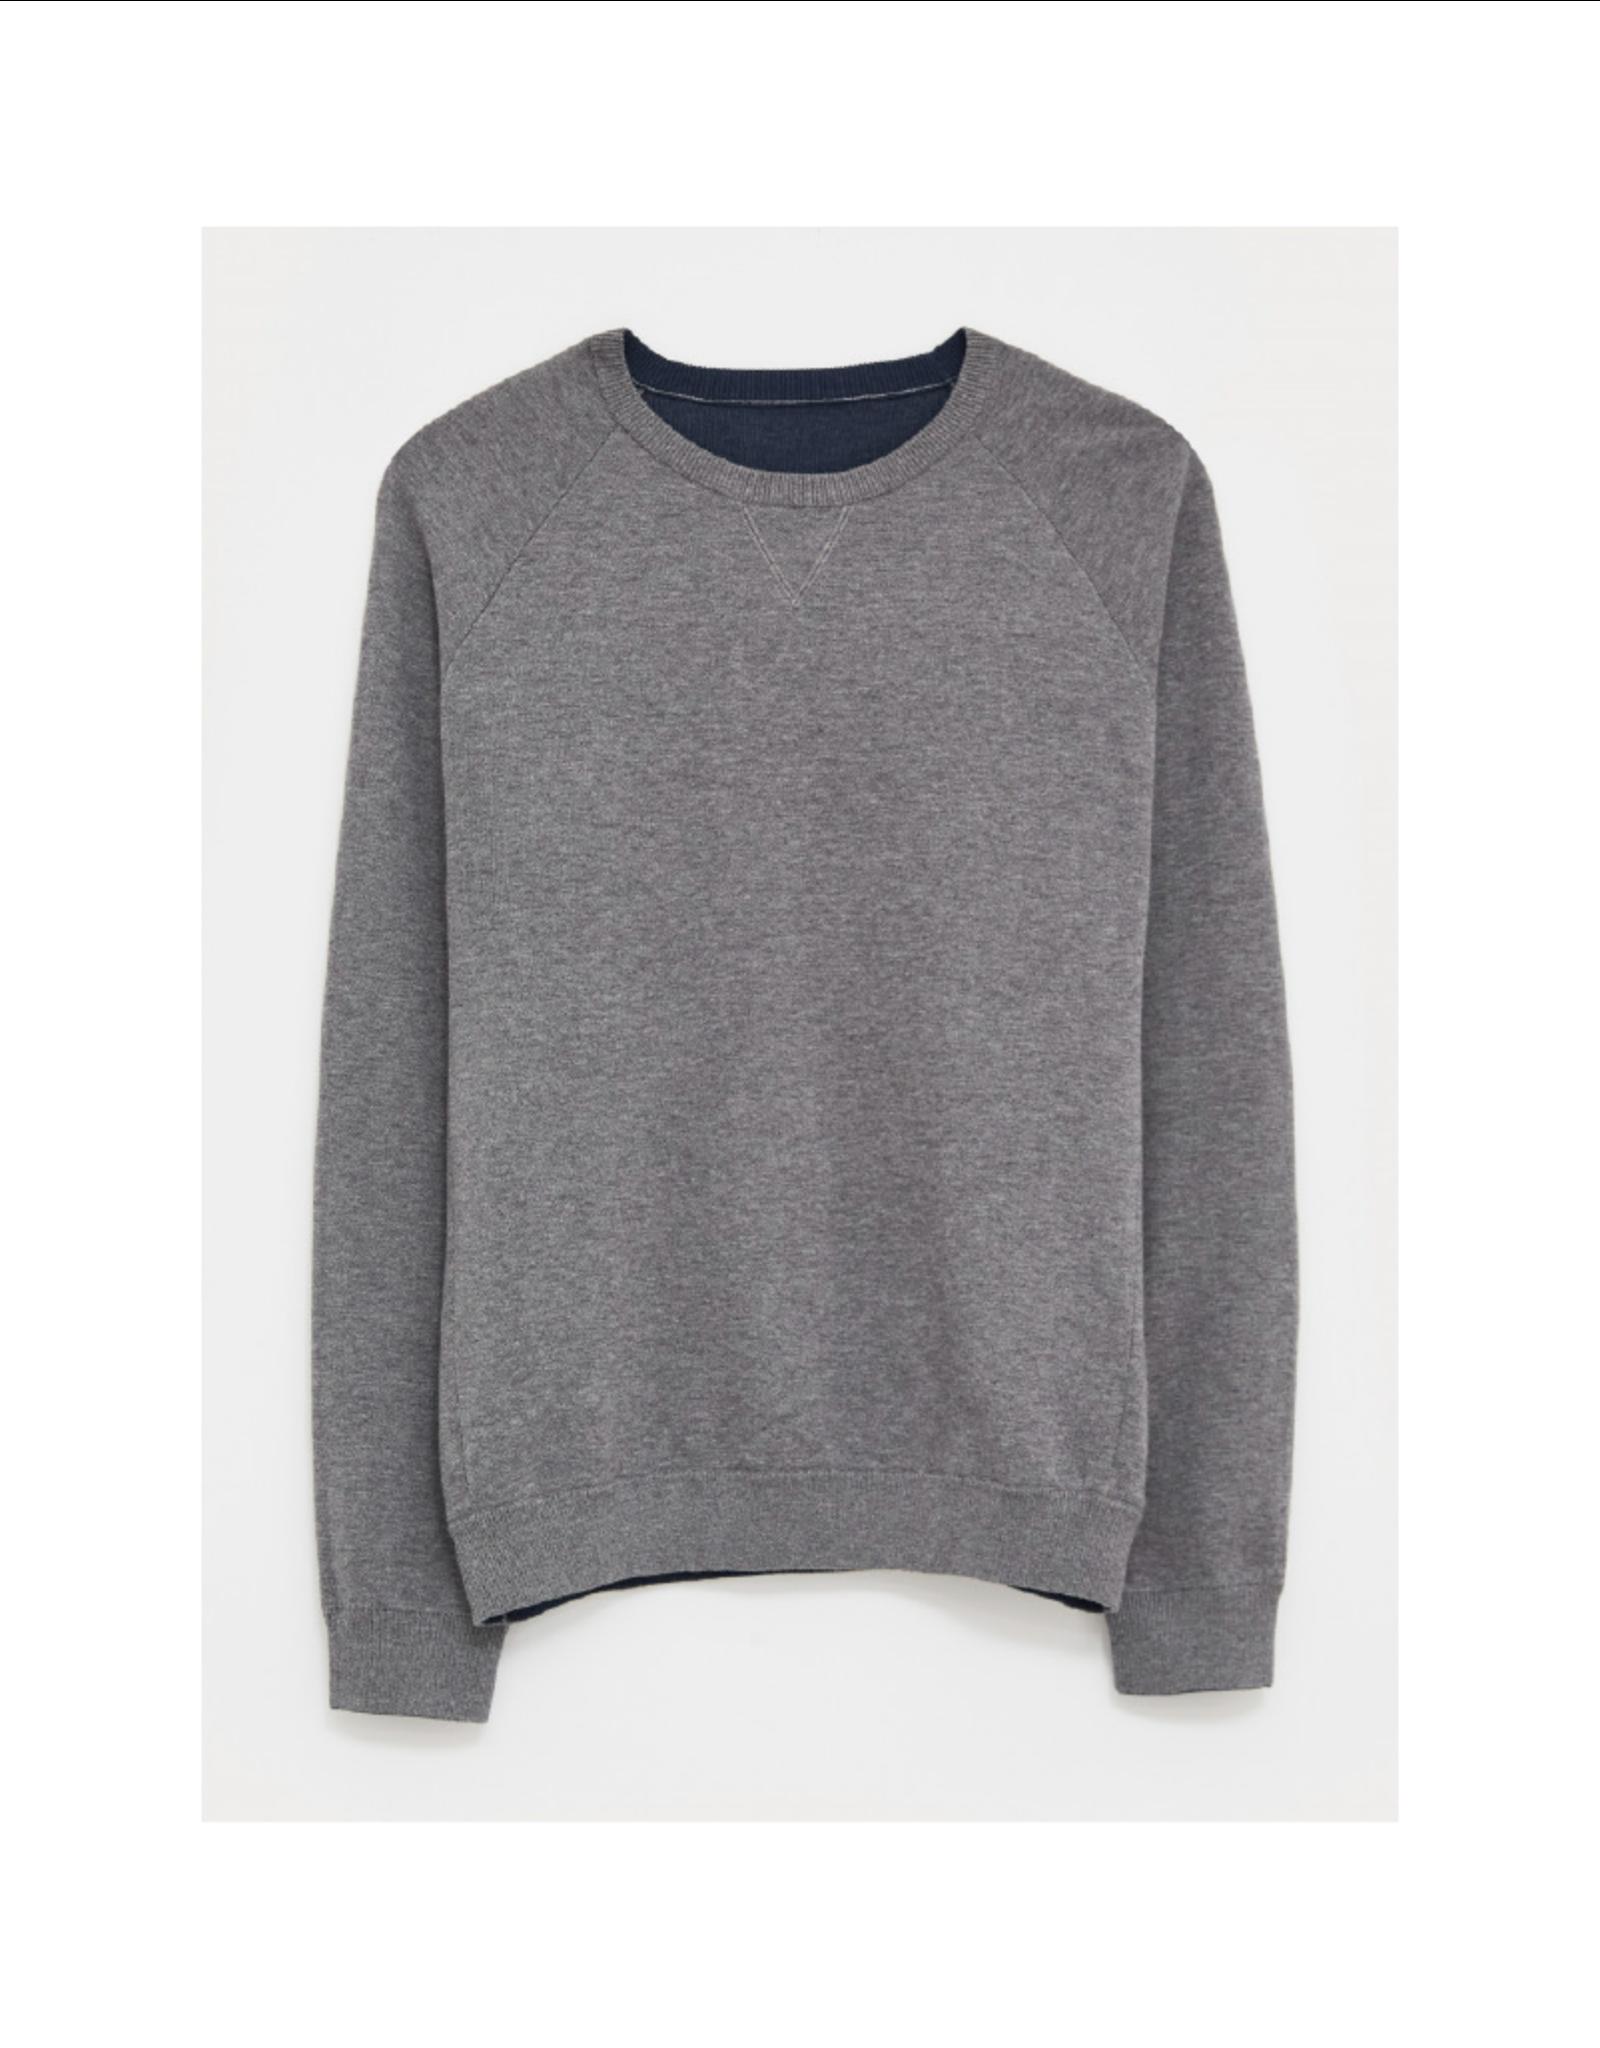 White Stuff Reversible Cotton Sweater